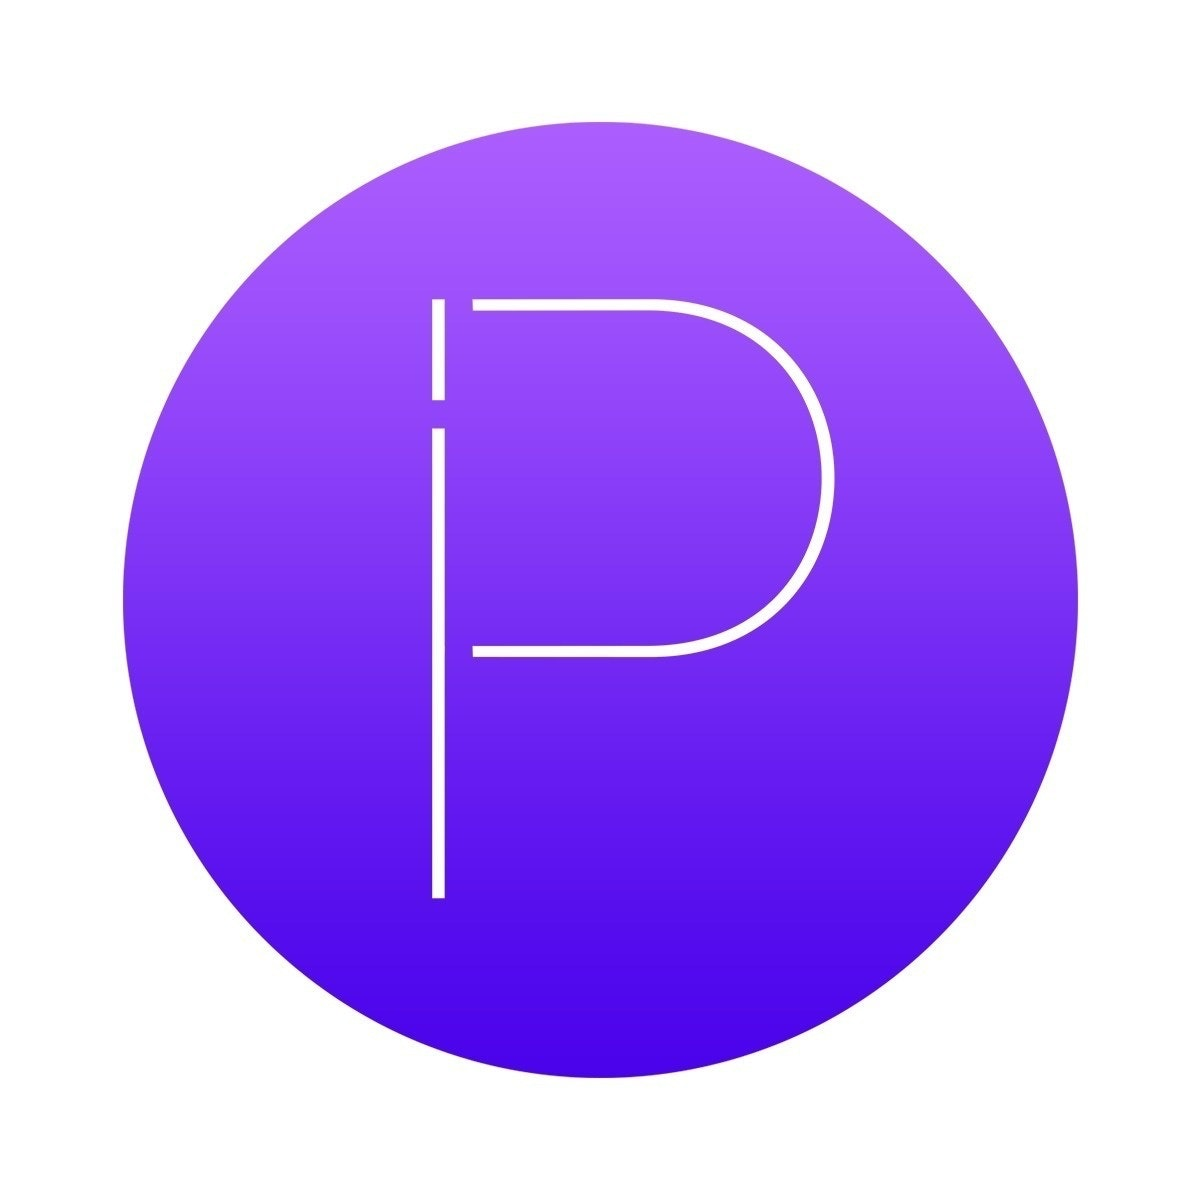 iPurpl3x